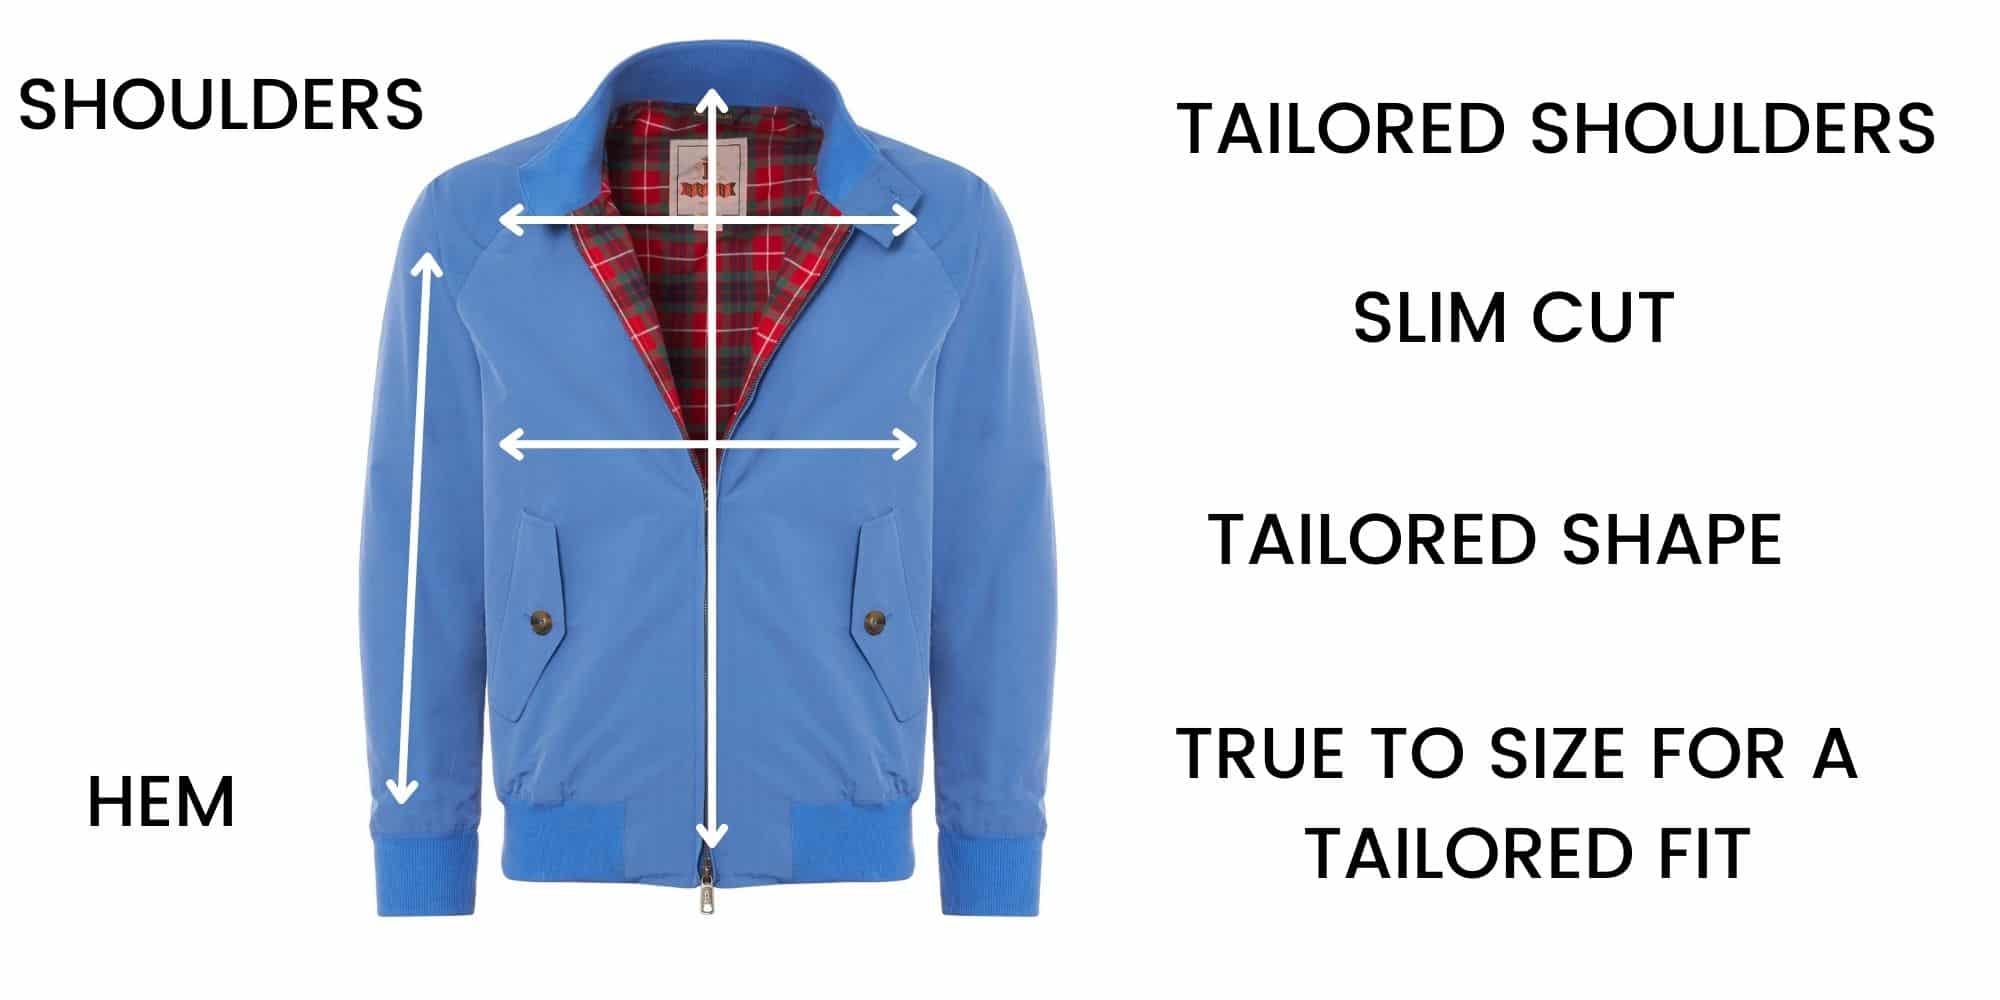 Baracuta Casual Jackets Size Guide